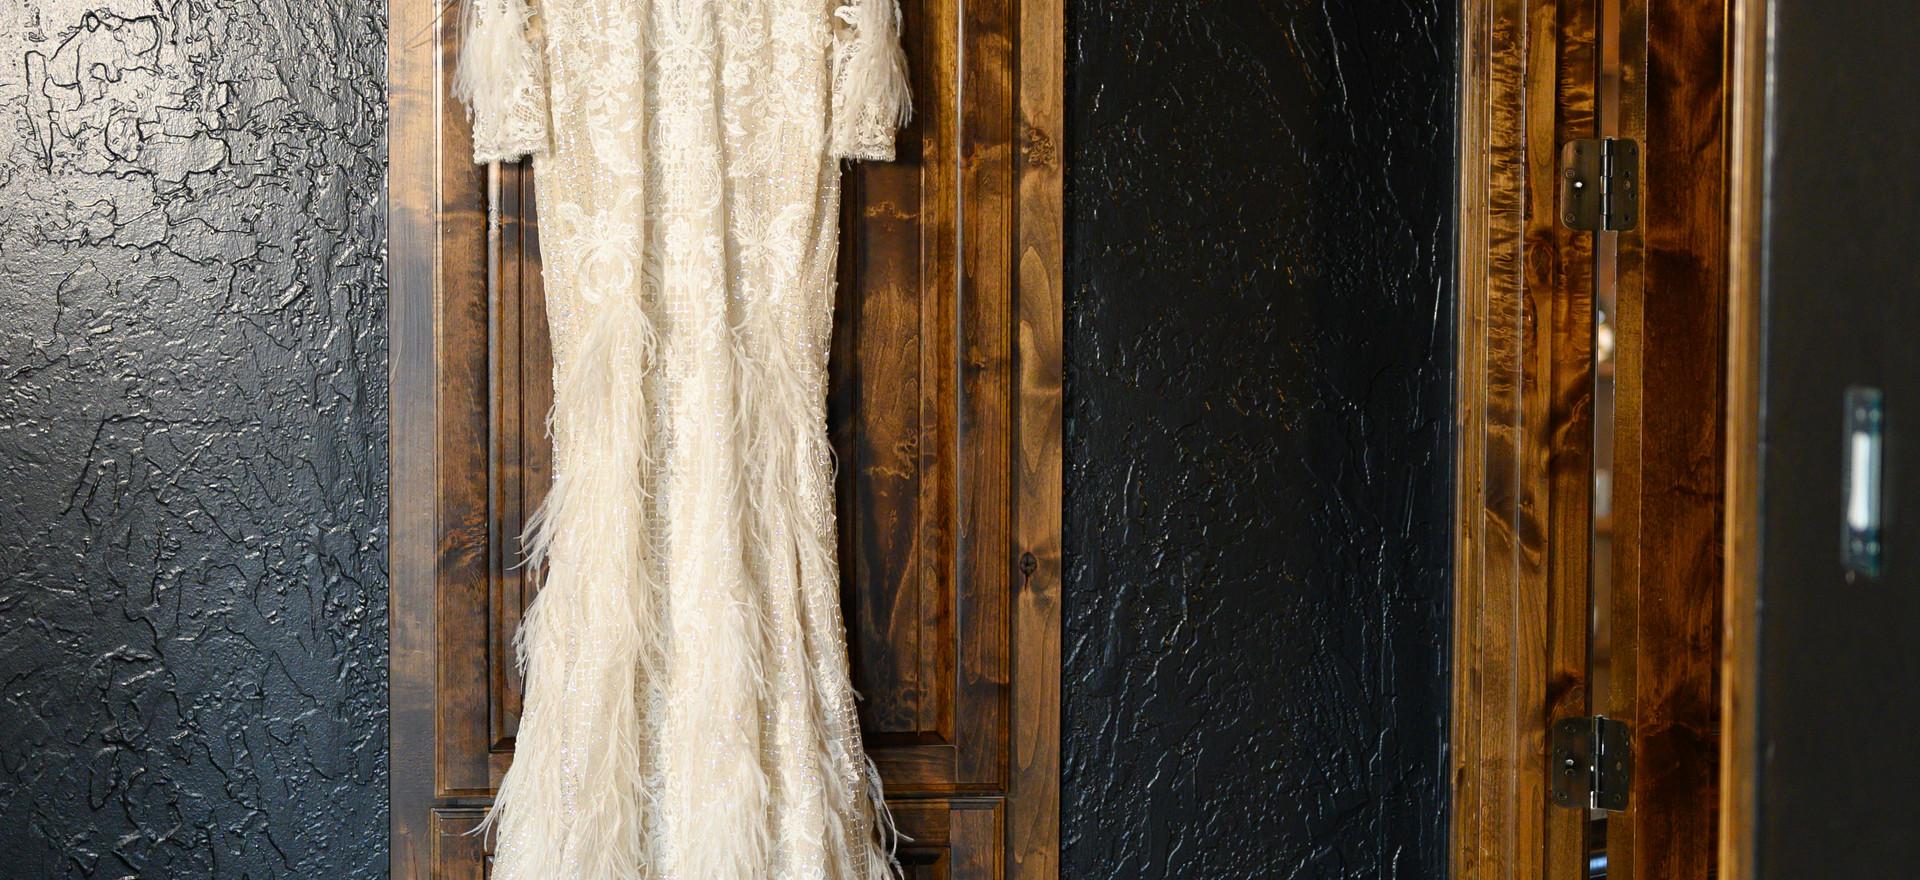 001_Lorena and Mike's Wedding day.jpg